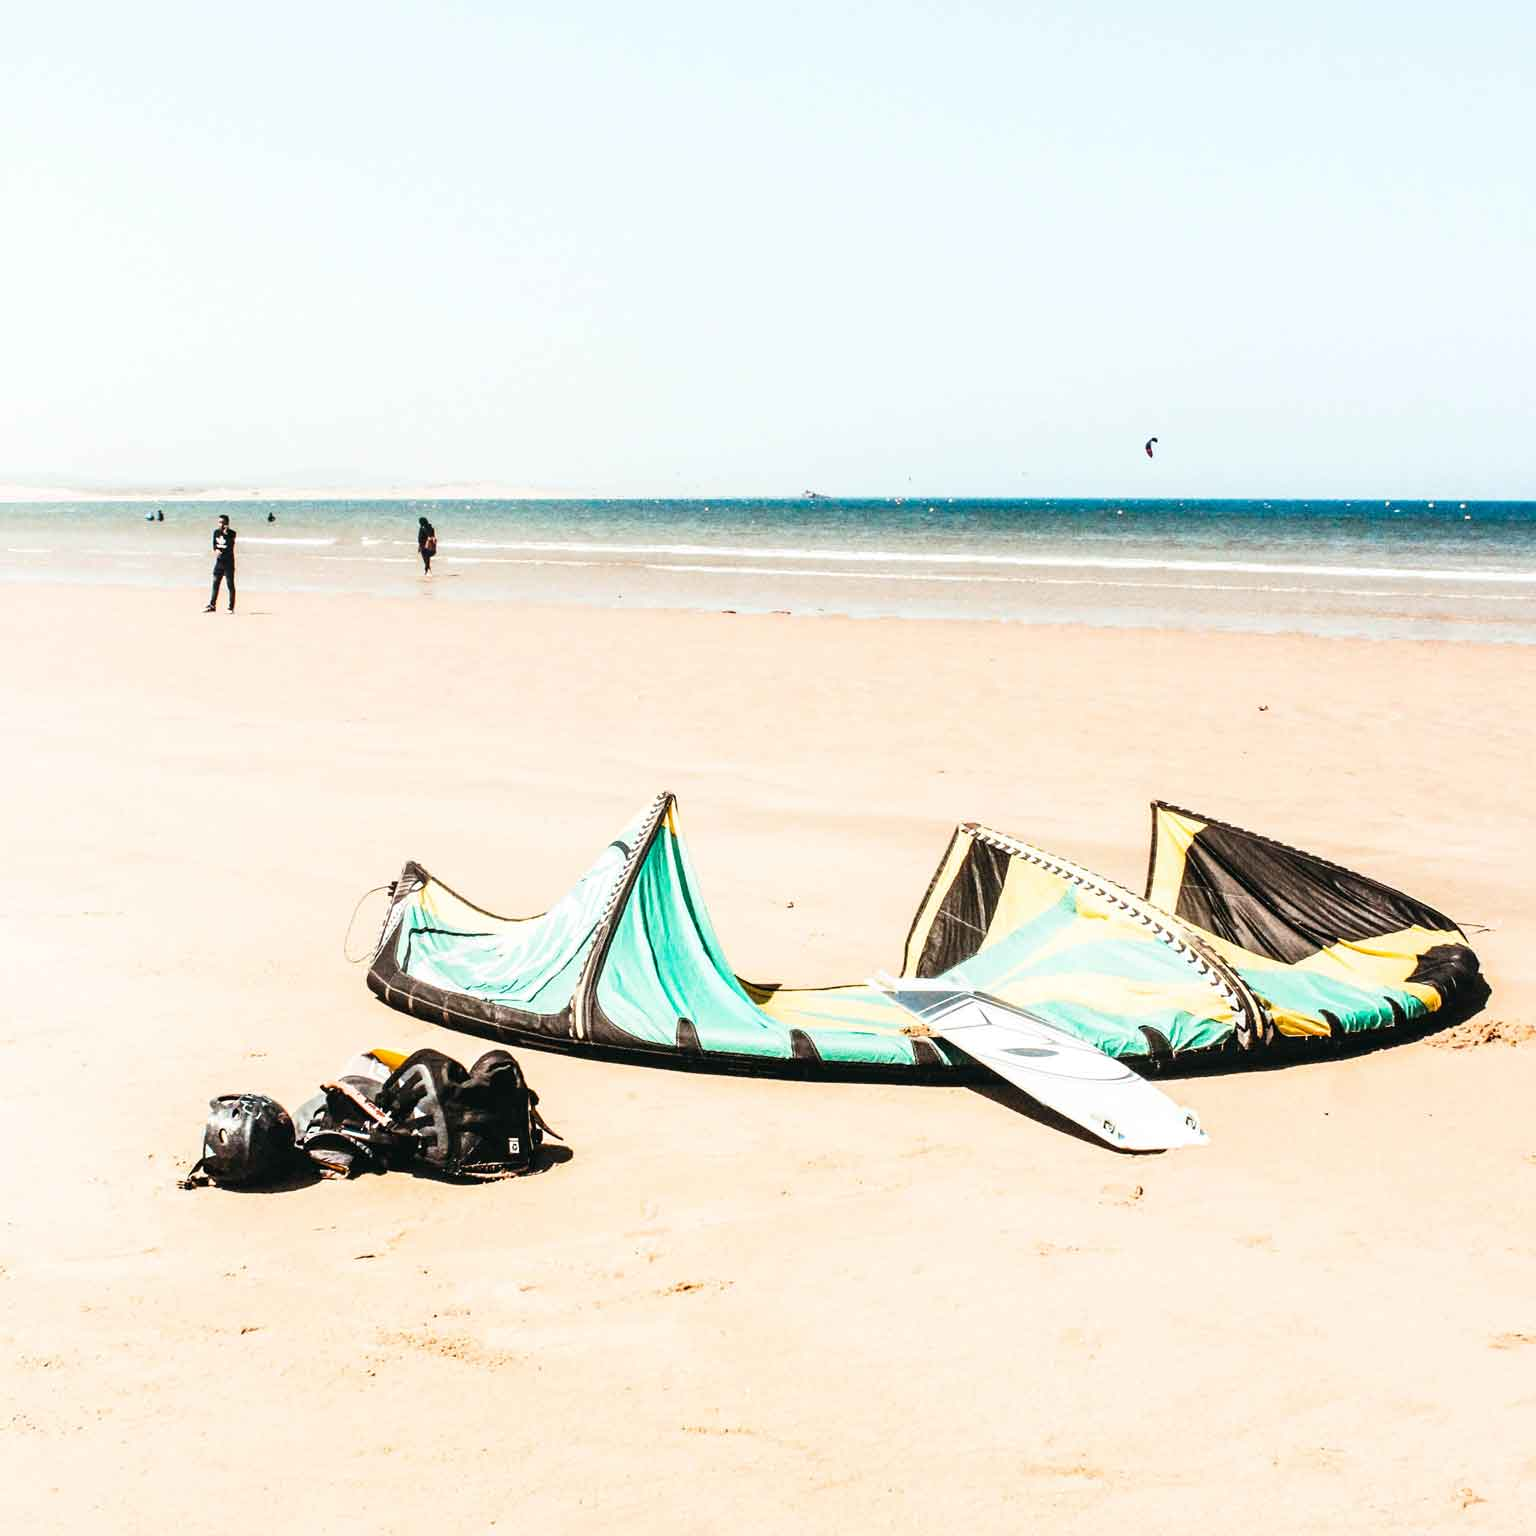 home-surf-kitesurf-casa-vacaciones-palmar-alquiler-vacacional-tropical-tuna